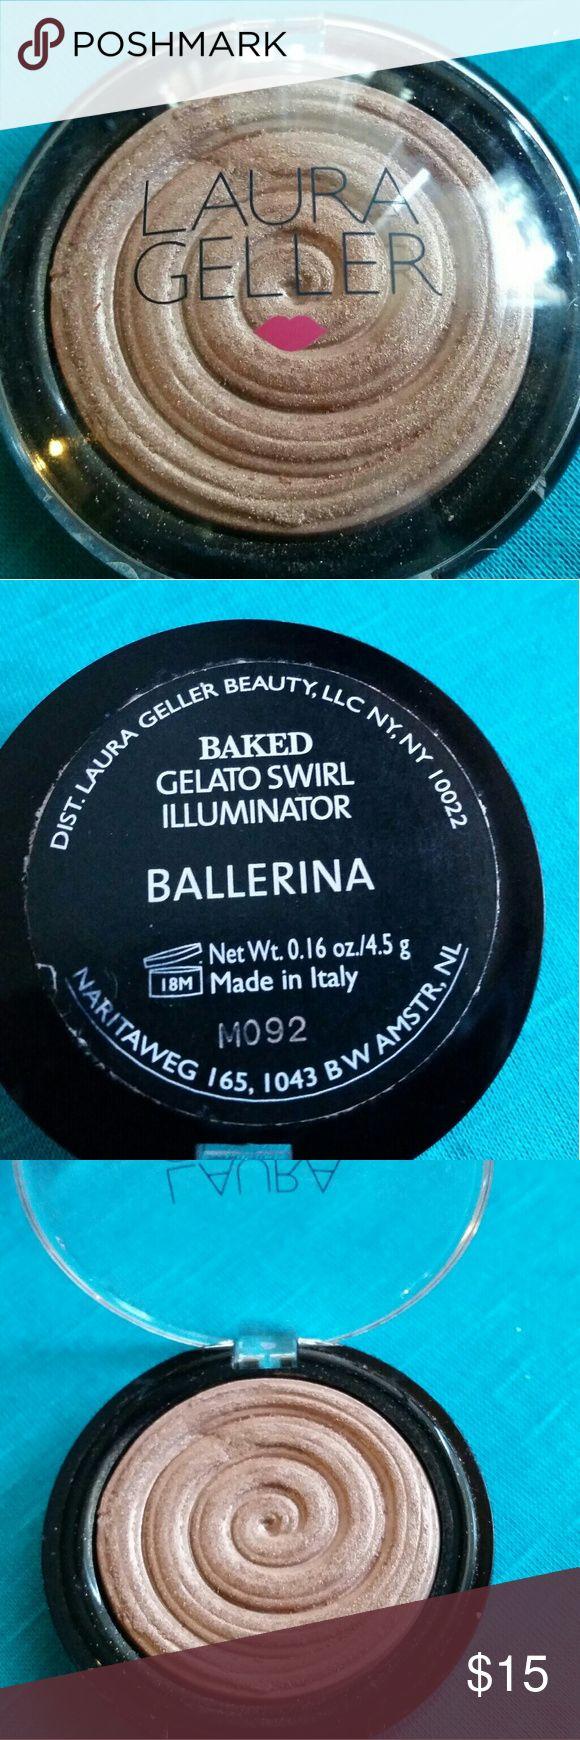 Laura Geller Highlighter Laura Geller Highlighter in Ballerina. Swatched a couple times, worn once. Sanitized. Laura Geller Makeup Luminizer